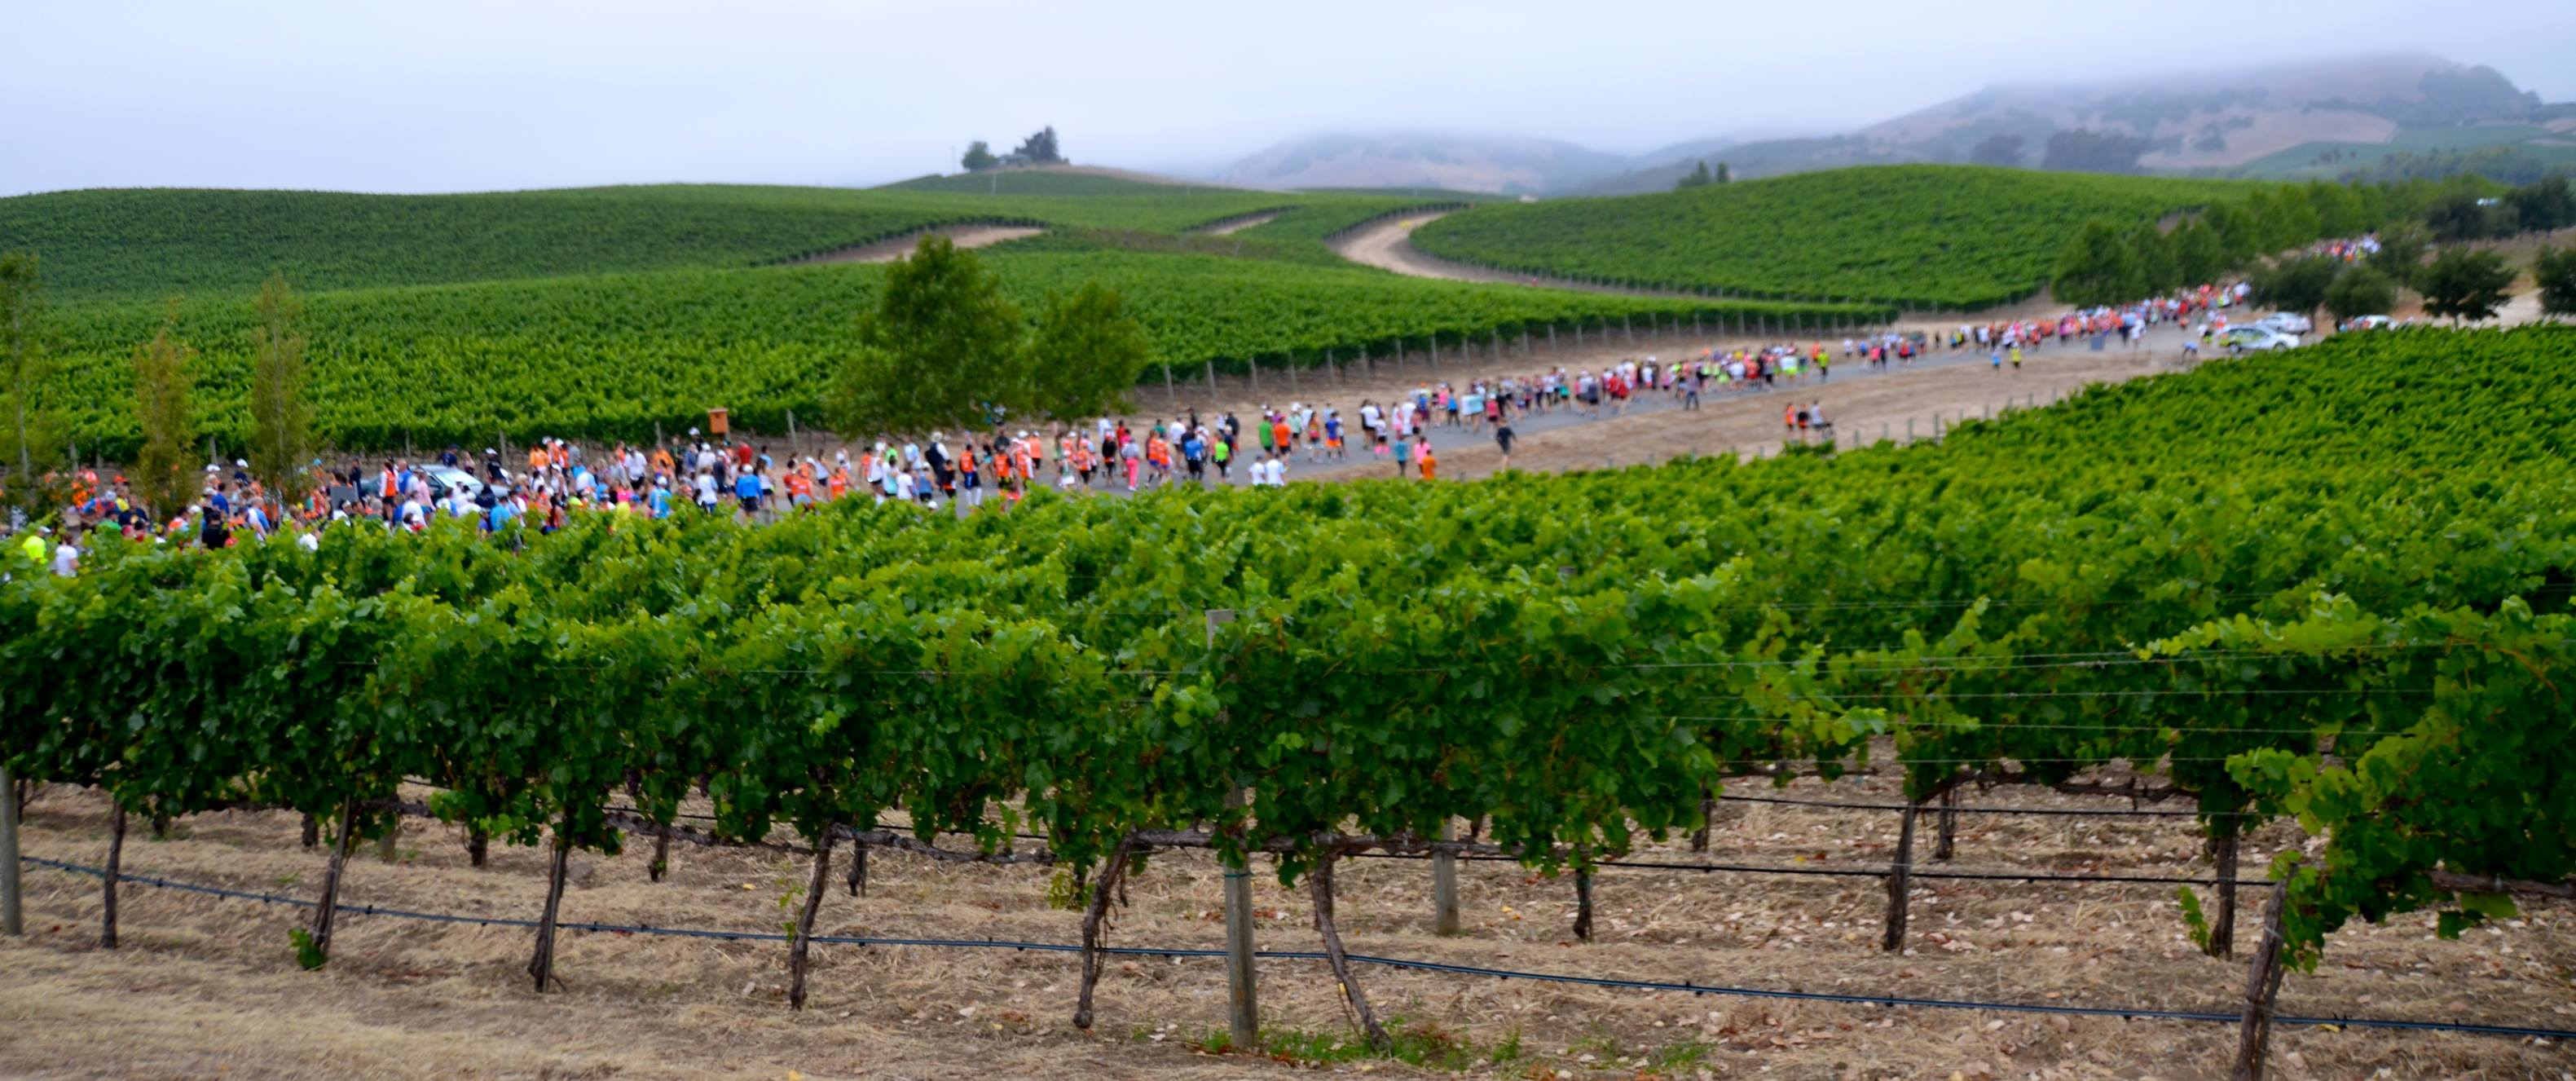 Napa To Sonoma Wine Country Half Marathon Best In Sonoma